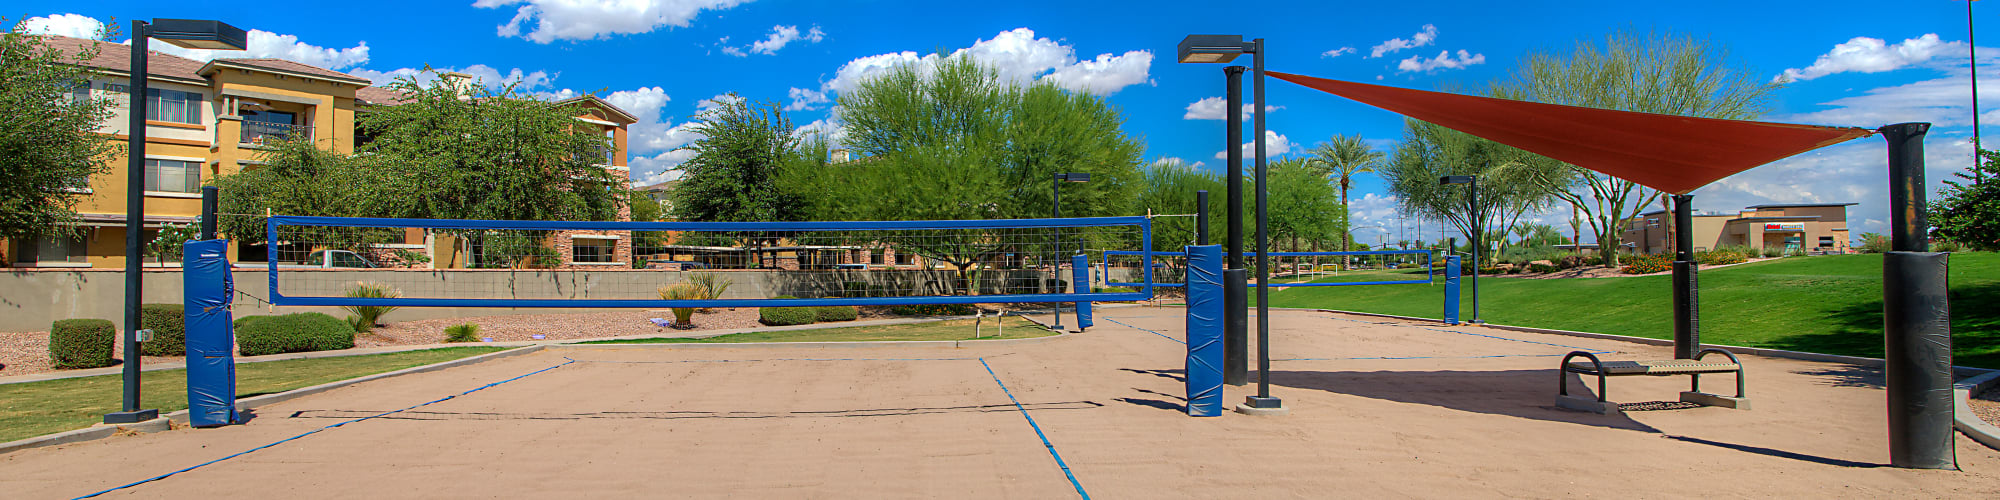 Photos of Azul at Spectrum in Gilbert, Arizona